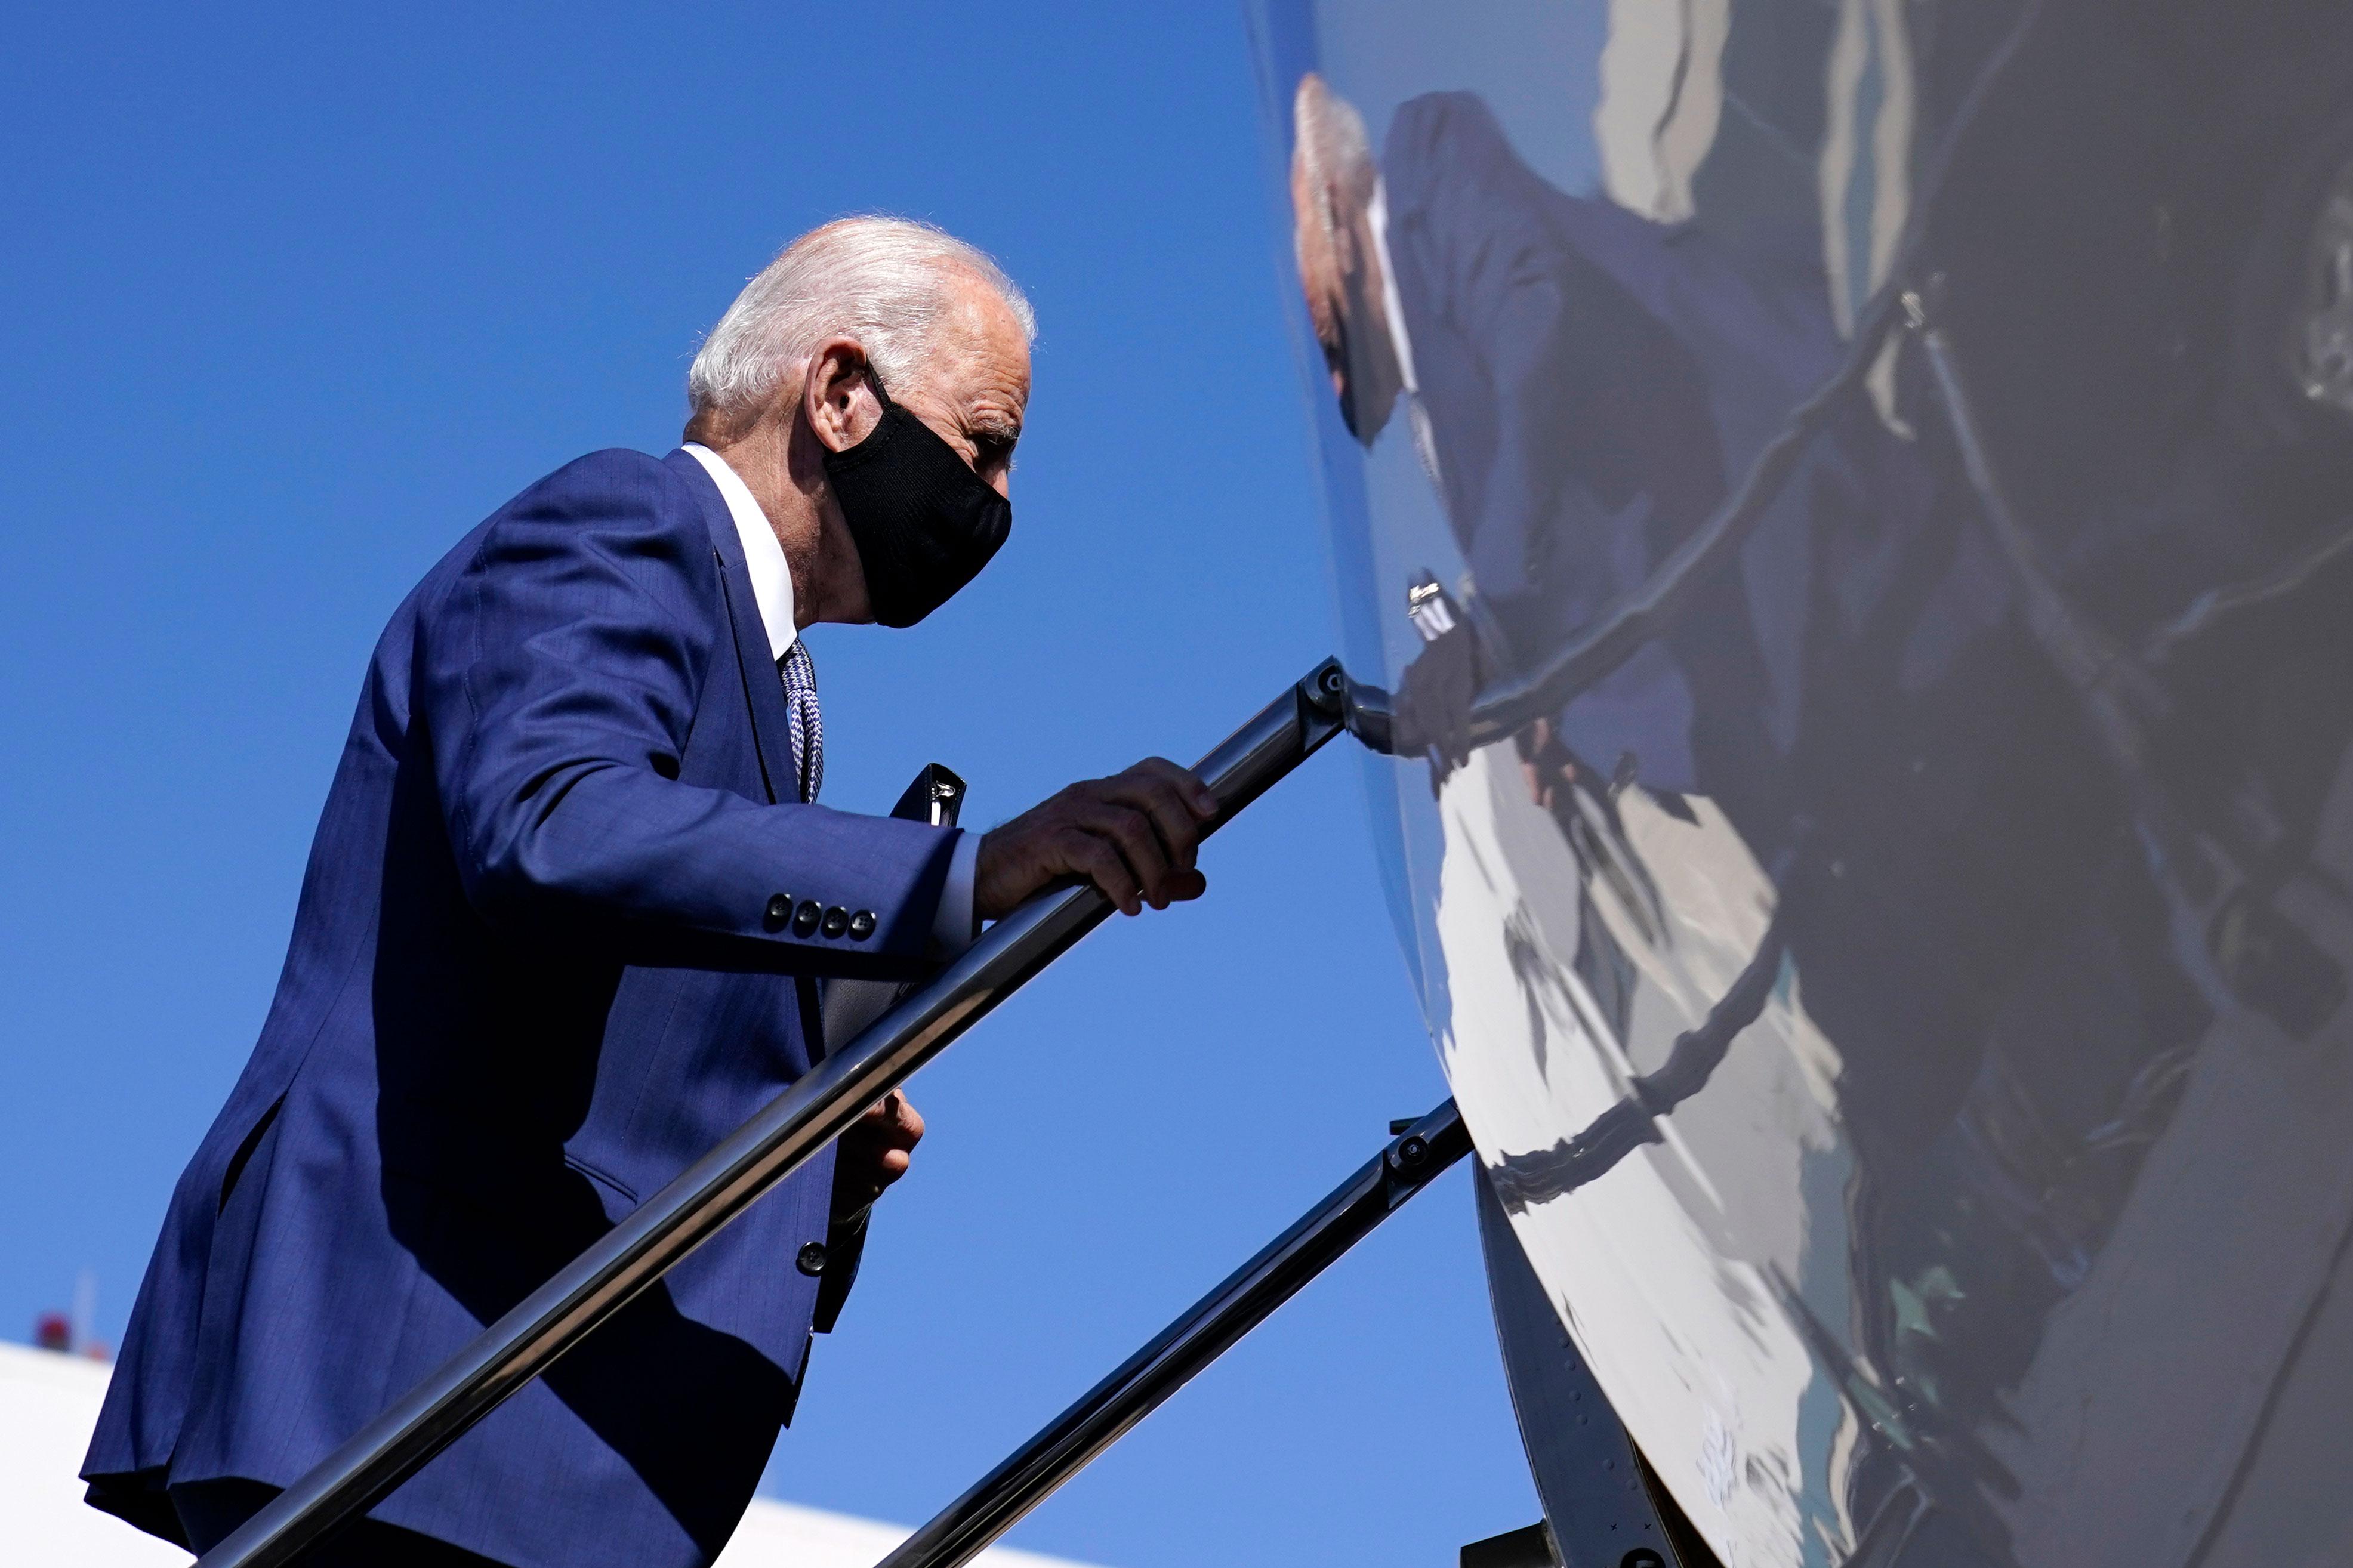 Joe Biden boards a plane en route to Manitowoc, Wisconsin, at New Castle Airport in Delaware on September 21.